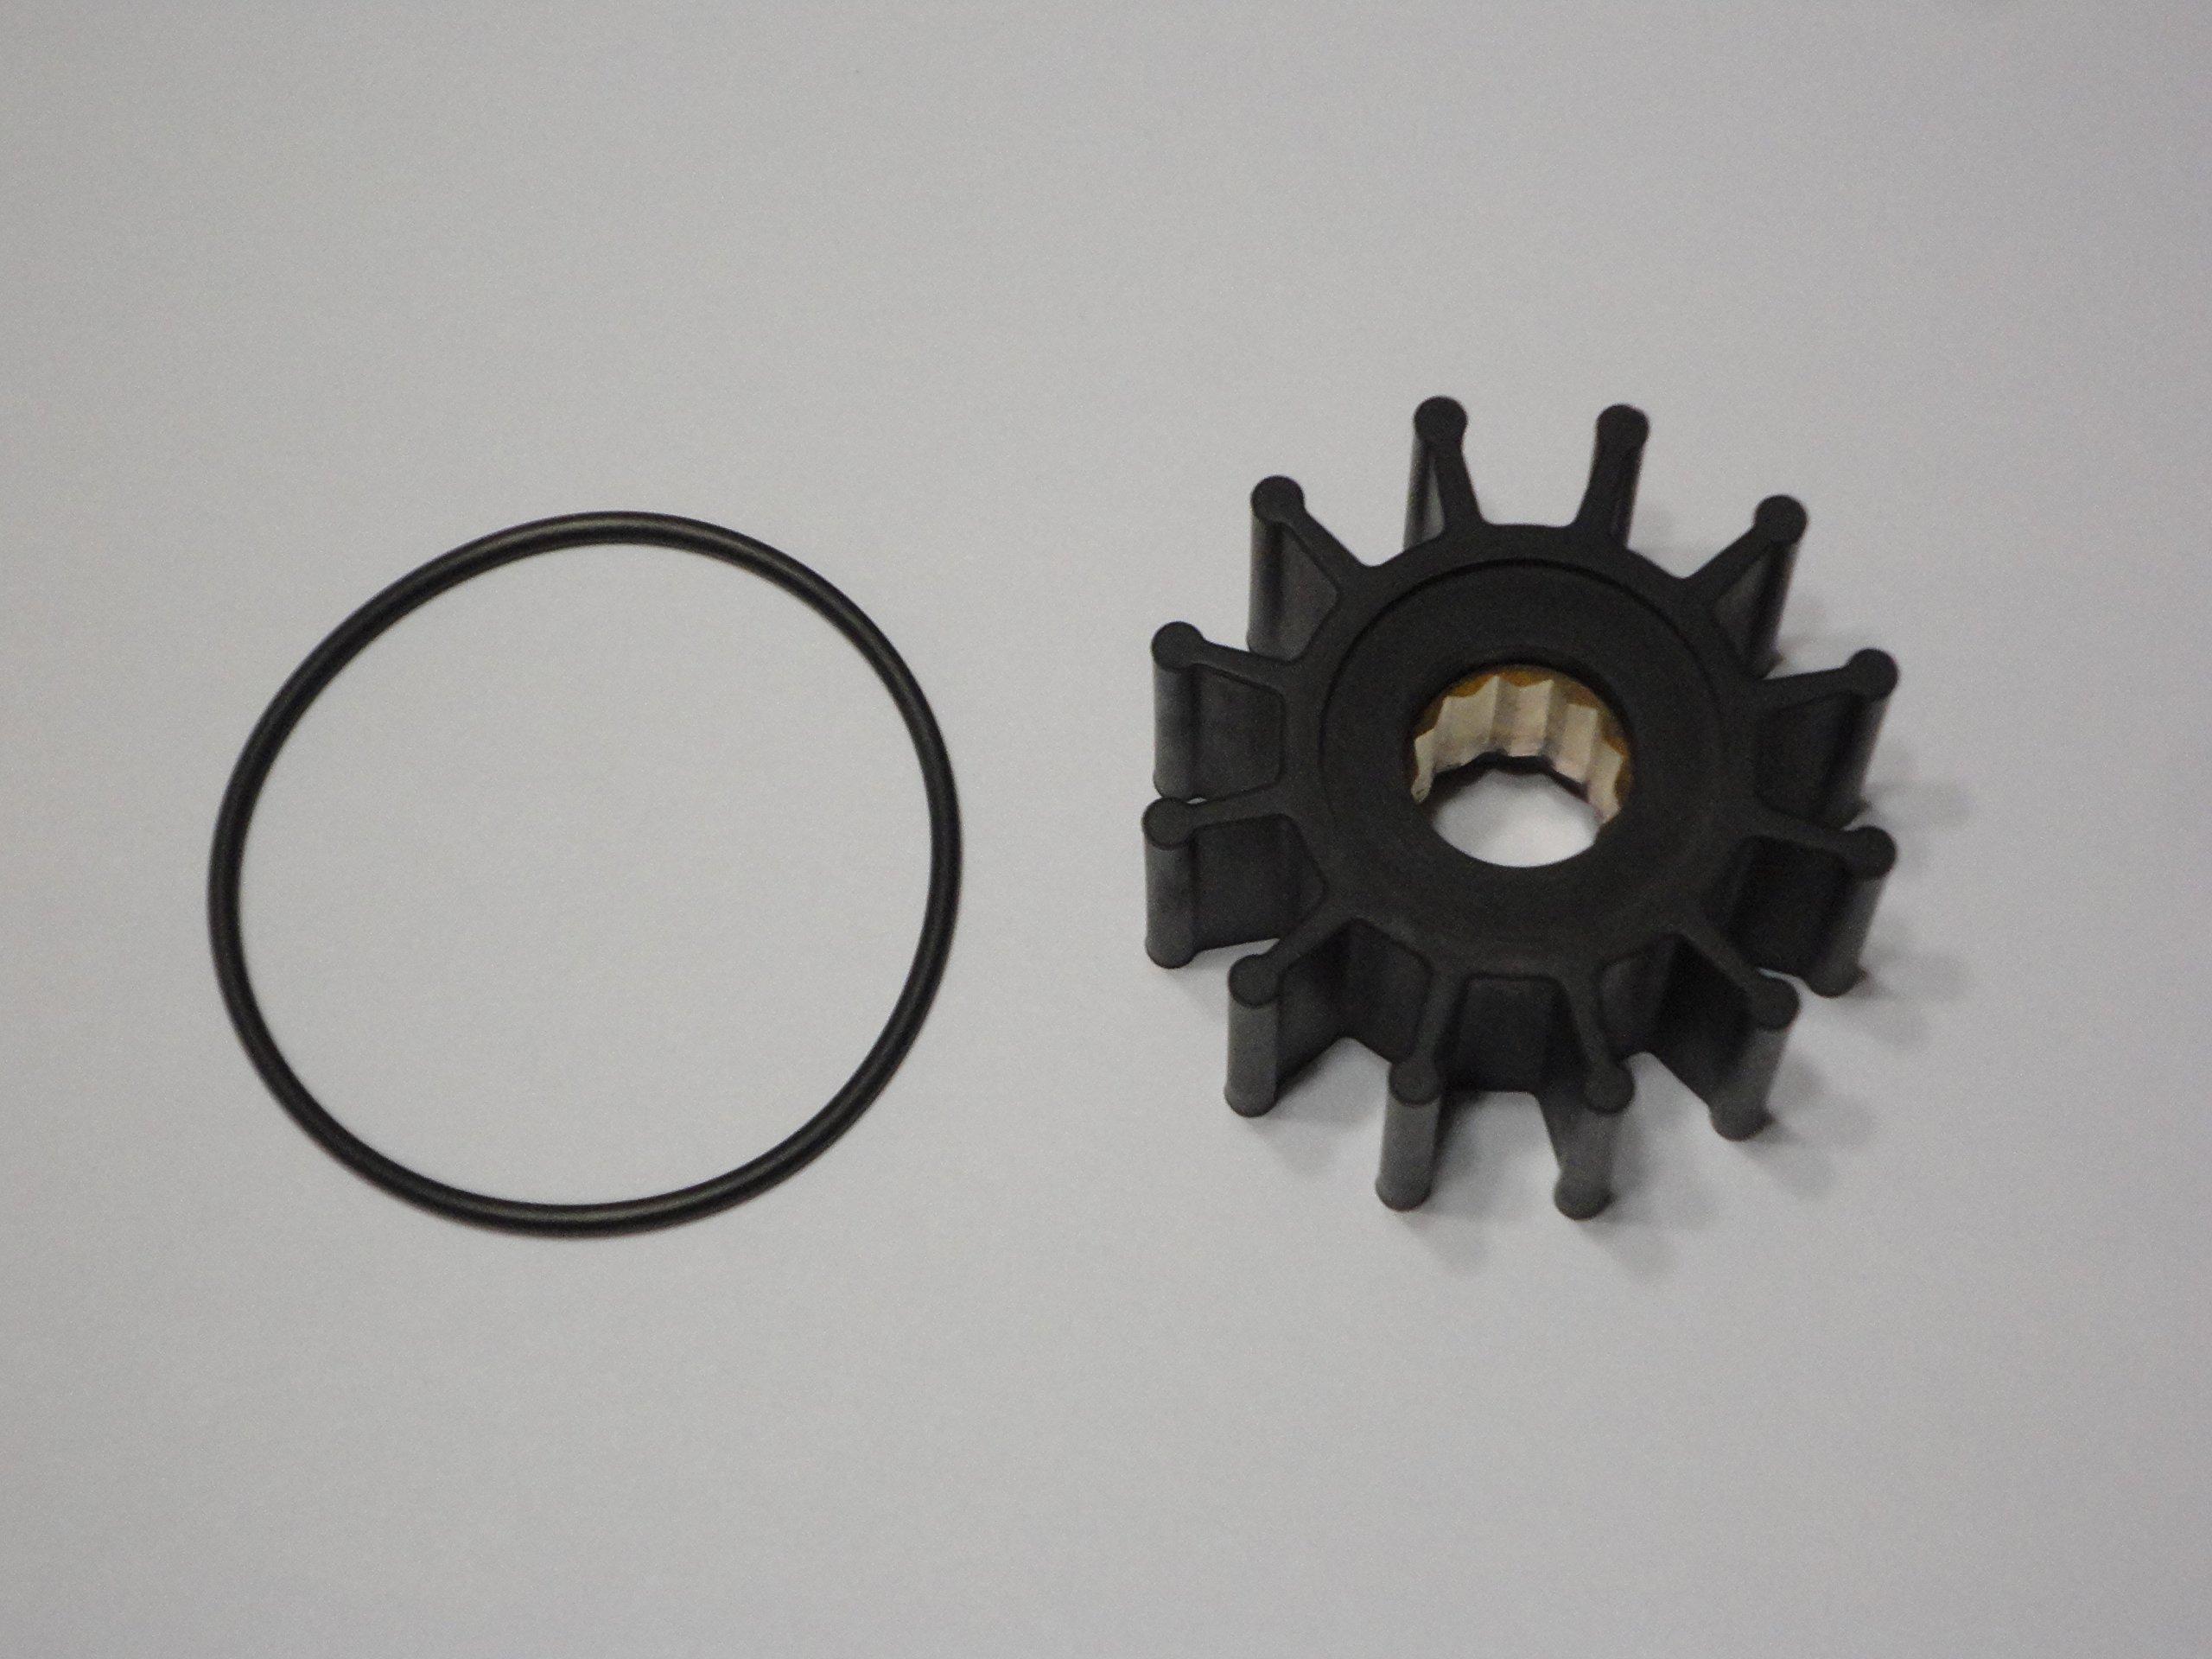 Impeller Kit Replaces Volvo Penta 21213660